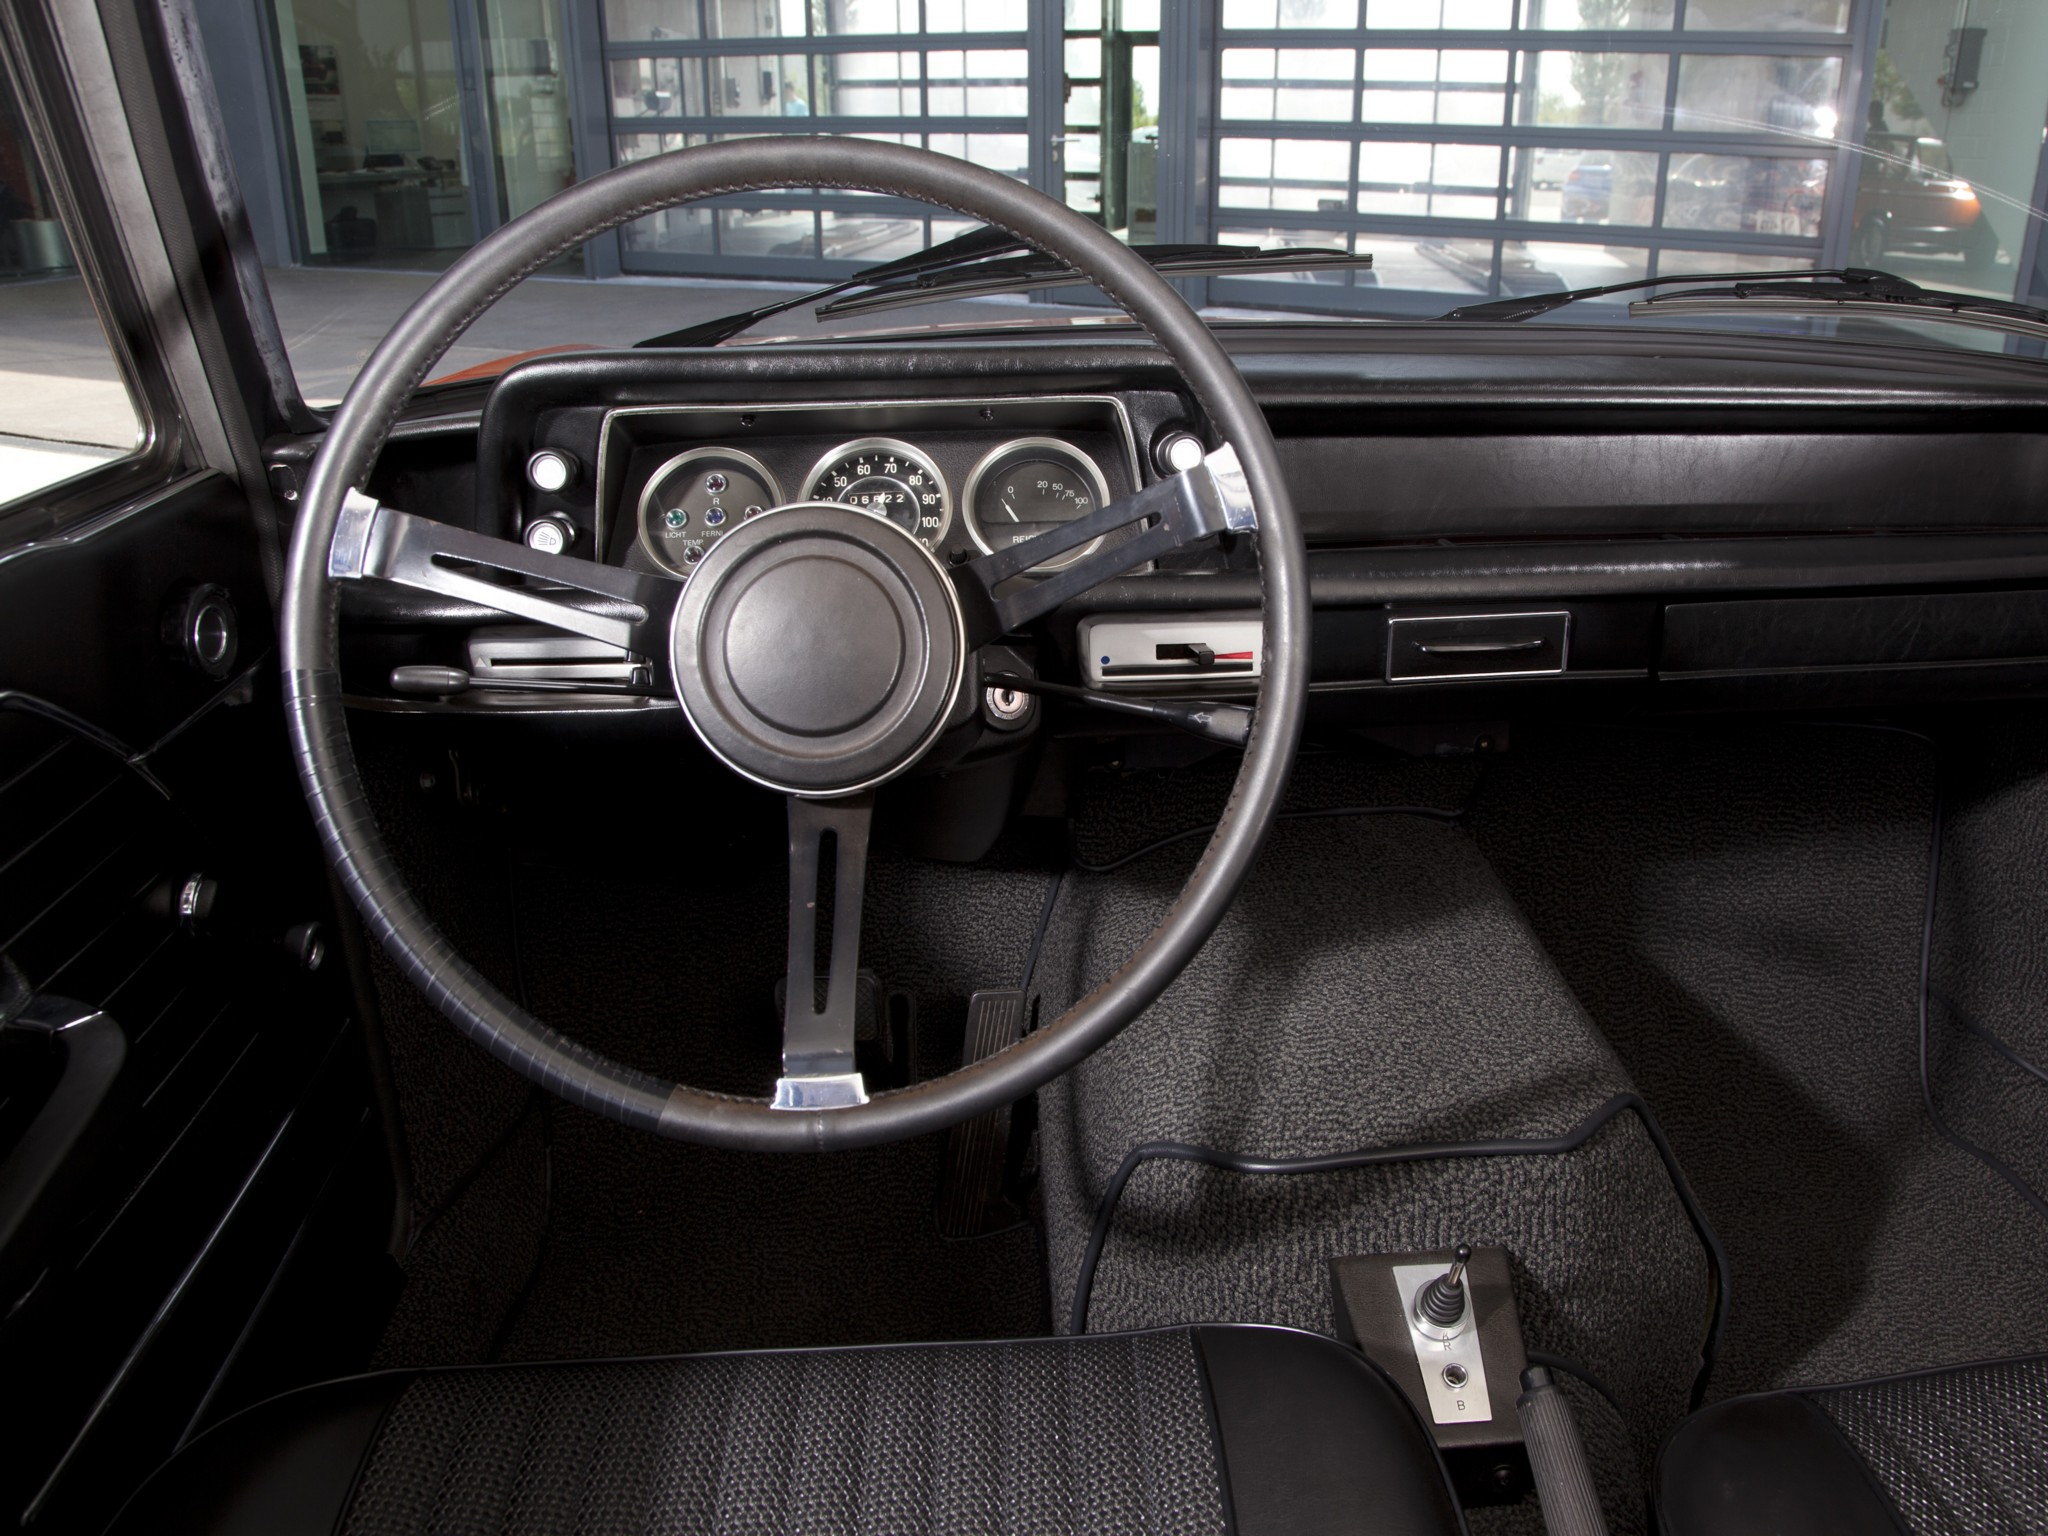 Bmw Dealer Near Me >> BMW 1602 Electro-Antrieb (E10) (1972) - Old Concept Cars